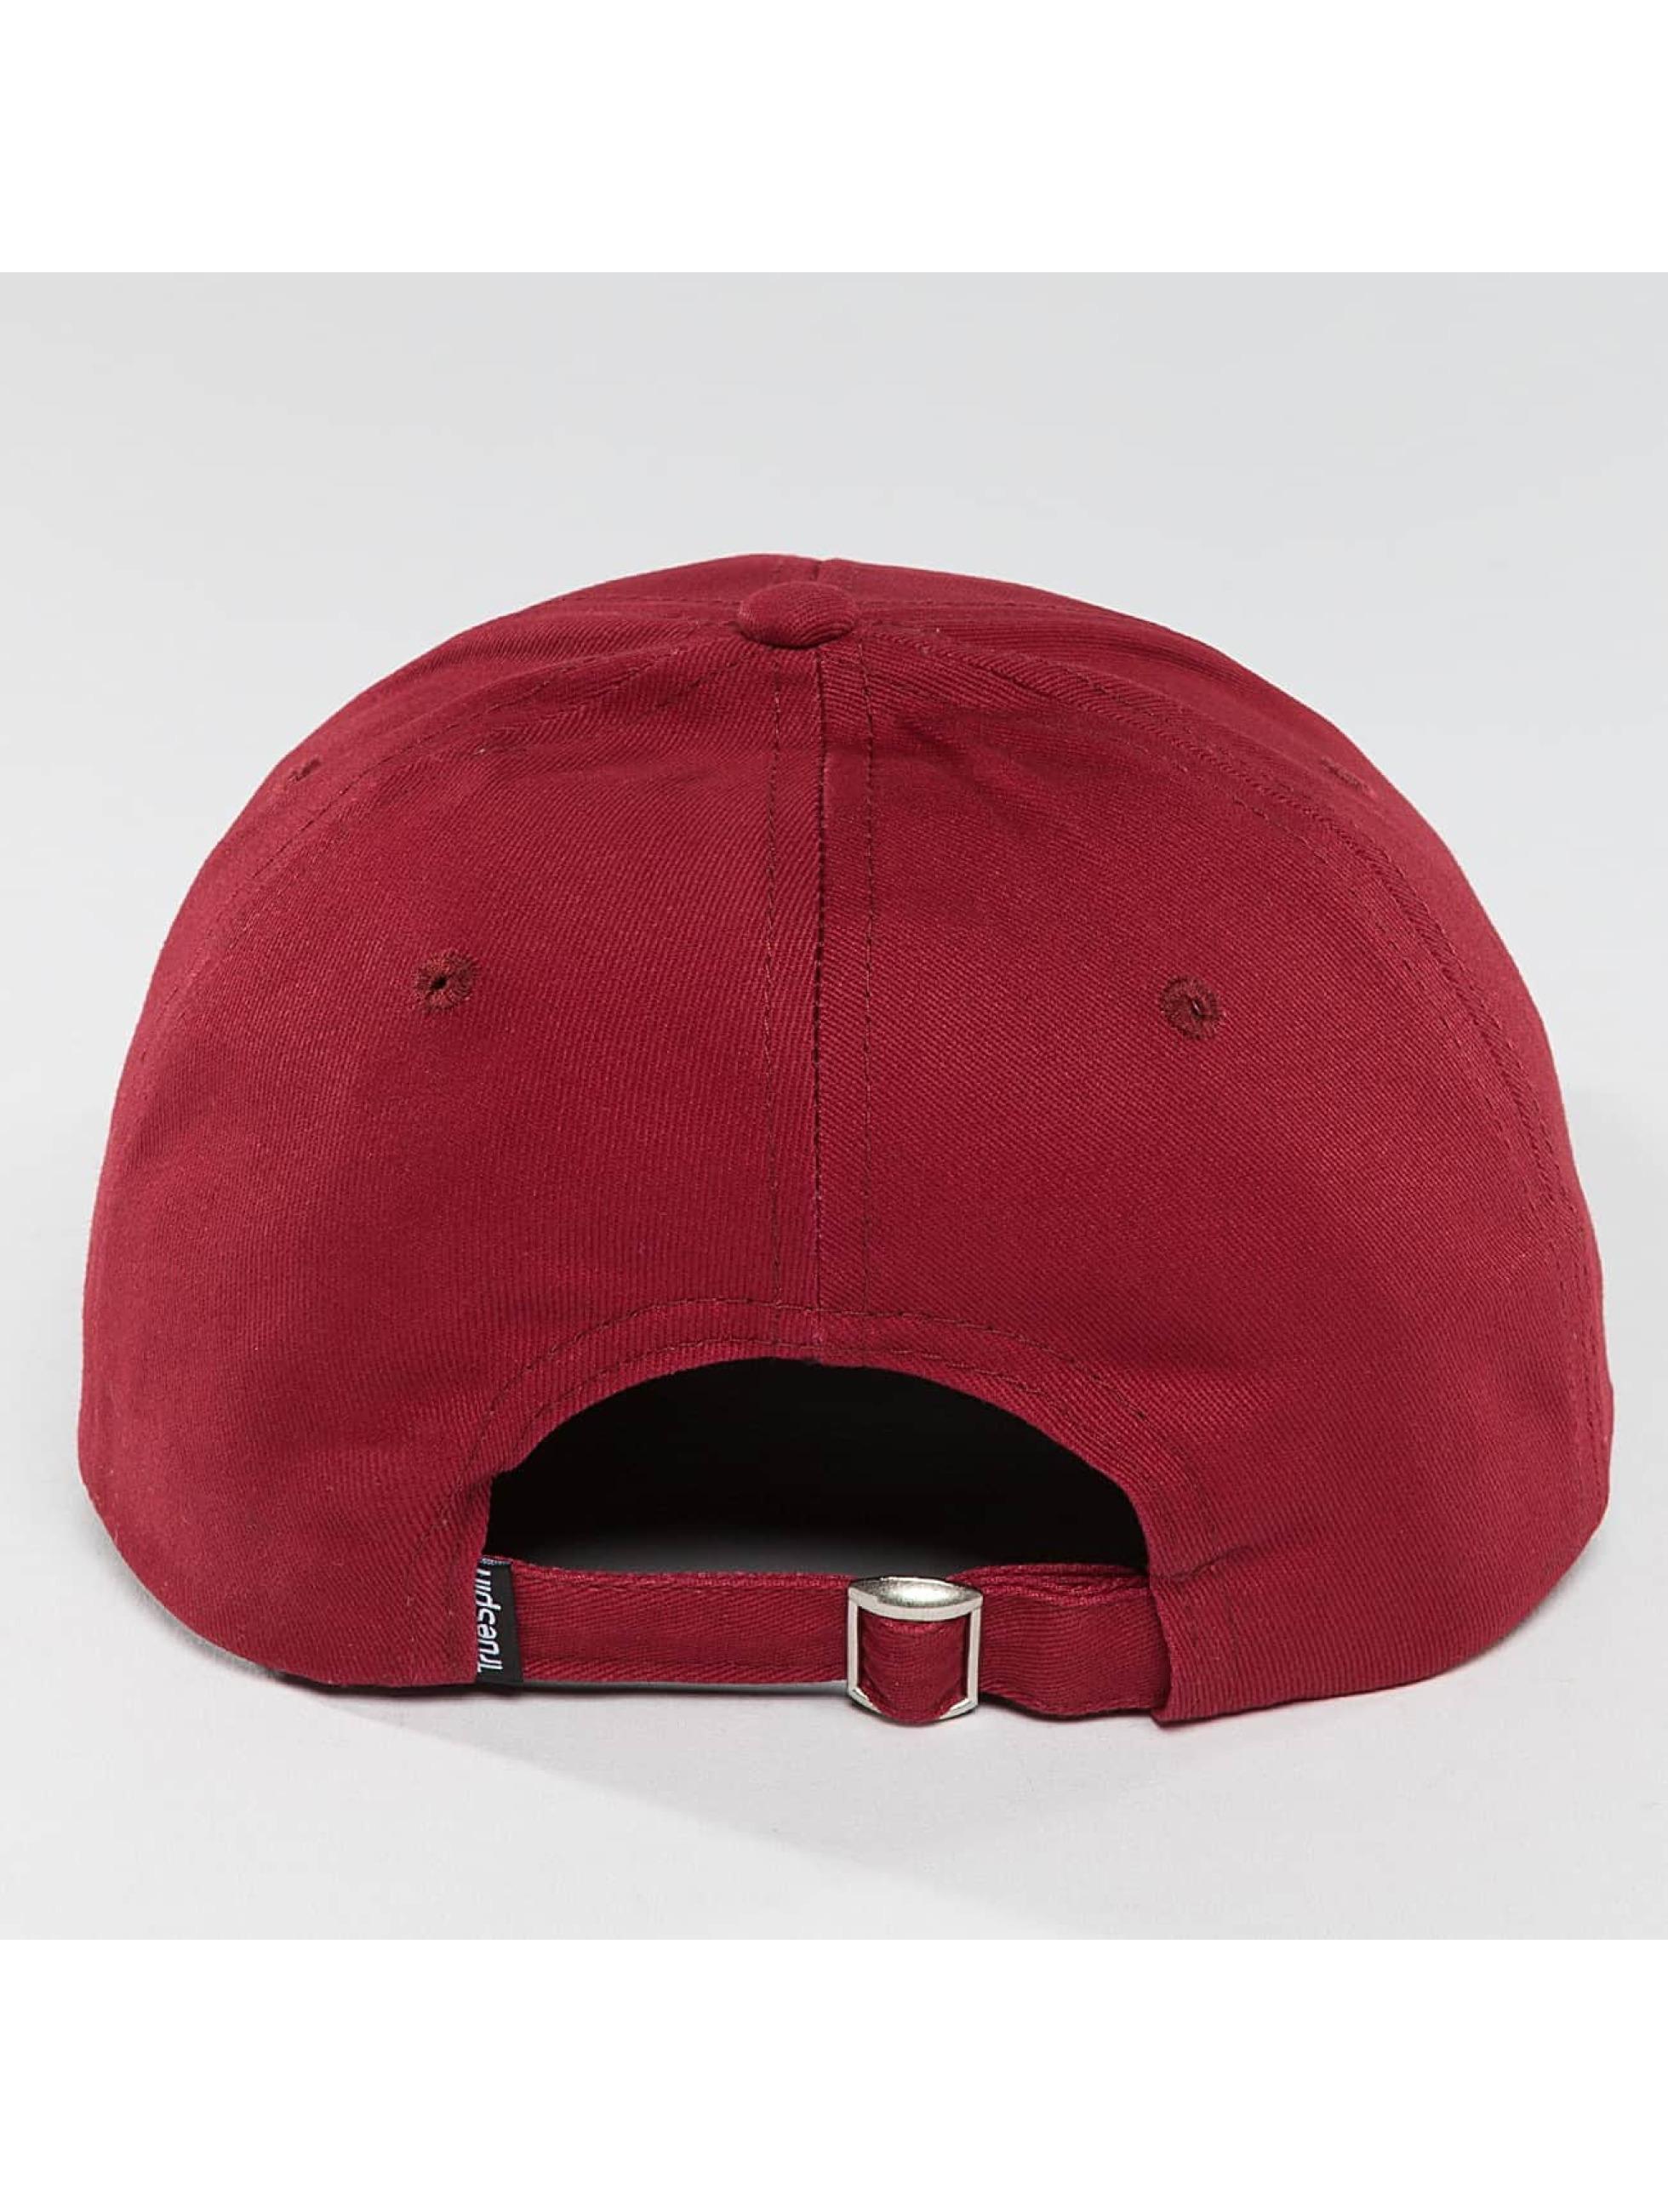 TrueSpin Casquette Snapback & Strapback Anker rouge